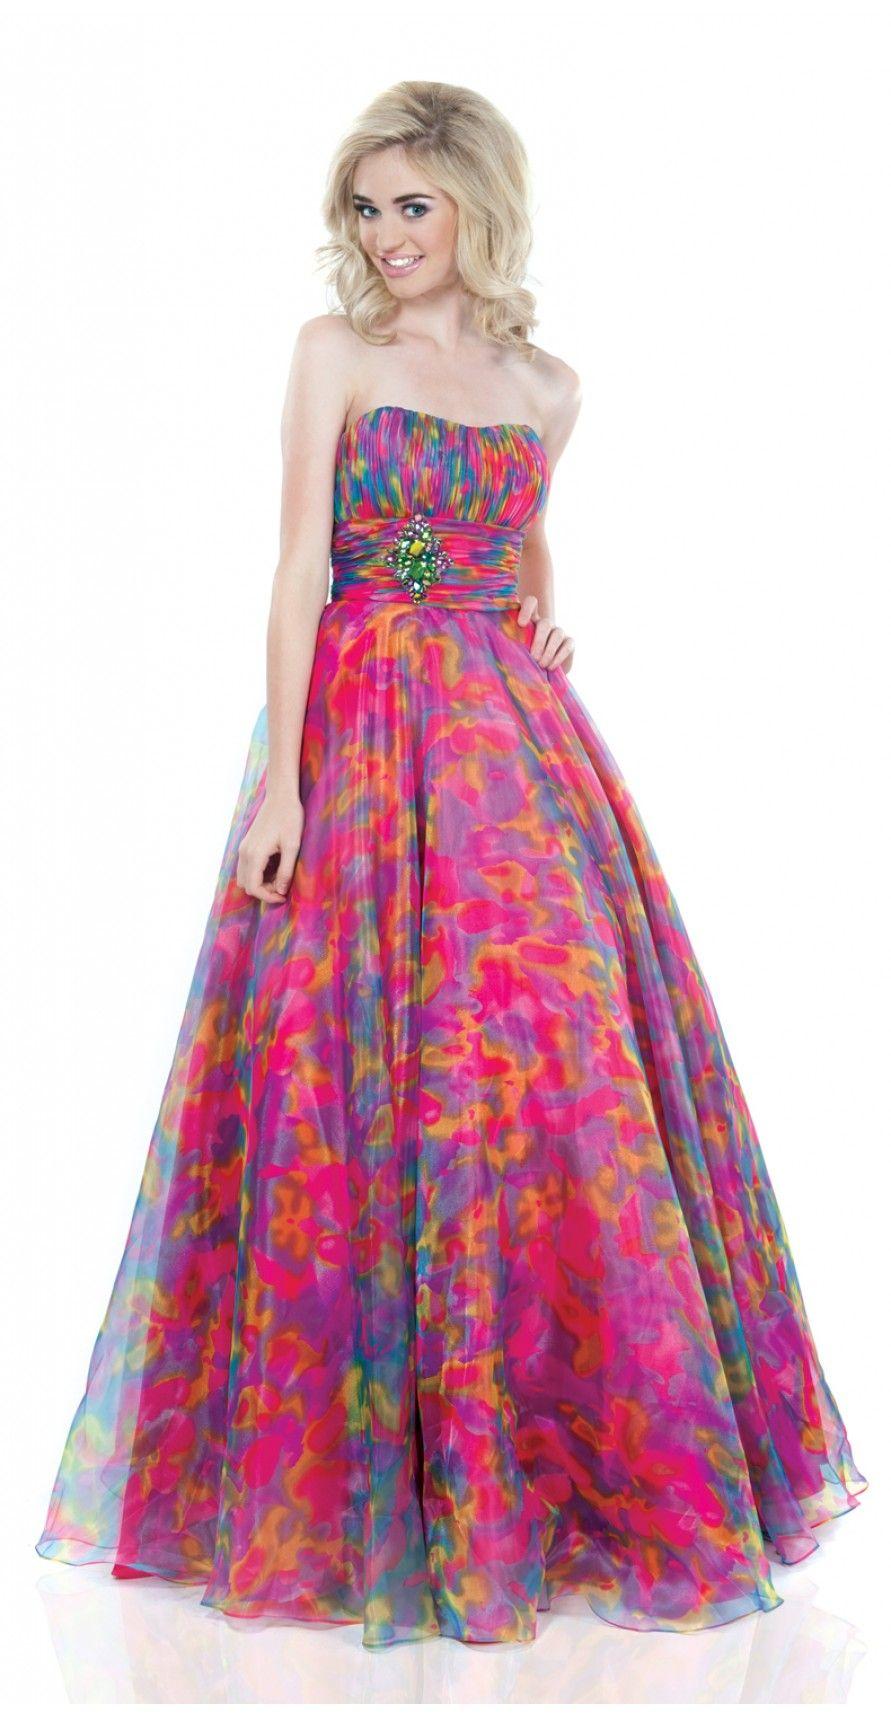 rainbow junior bridesmaid dress | my fav. bridesmaid dresses ...